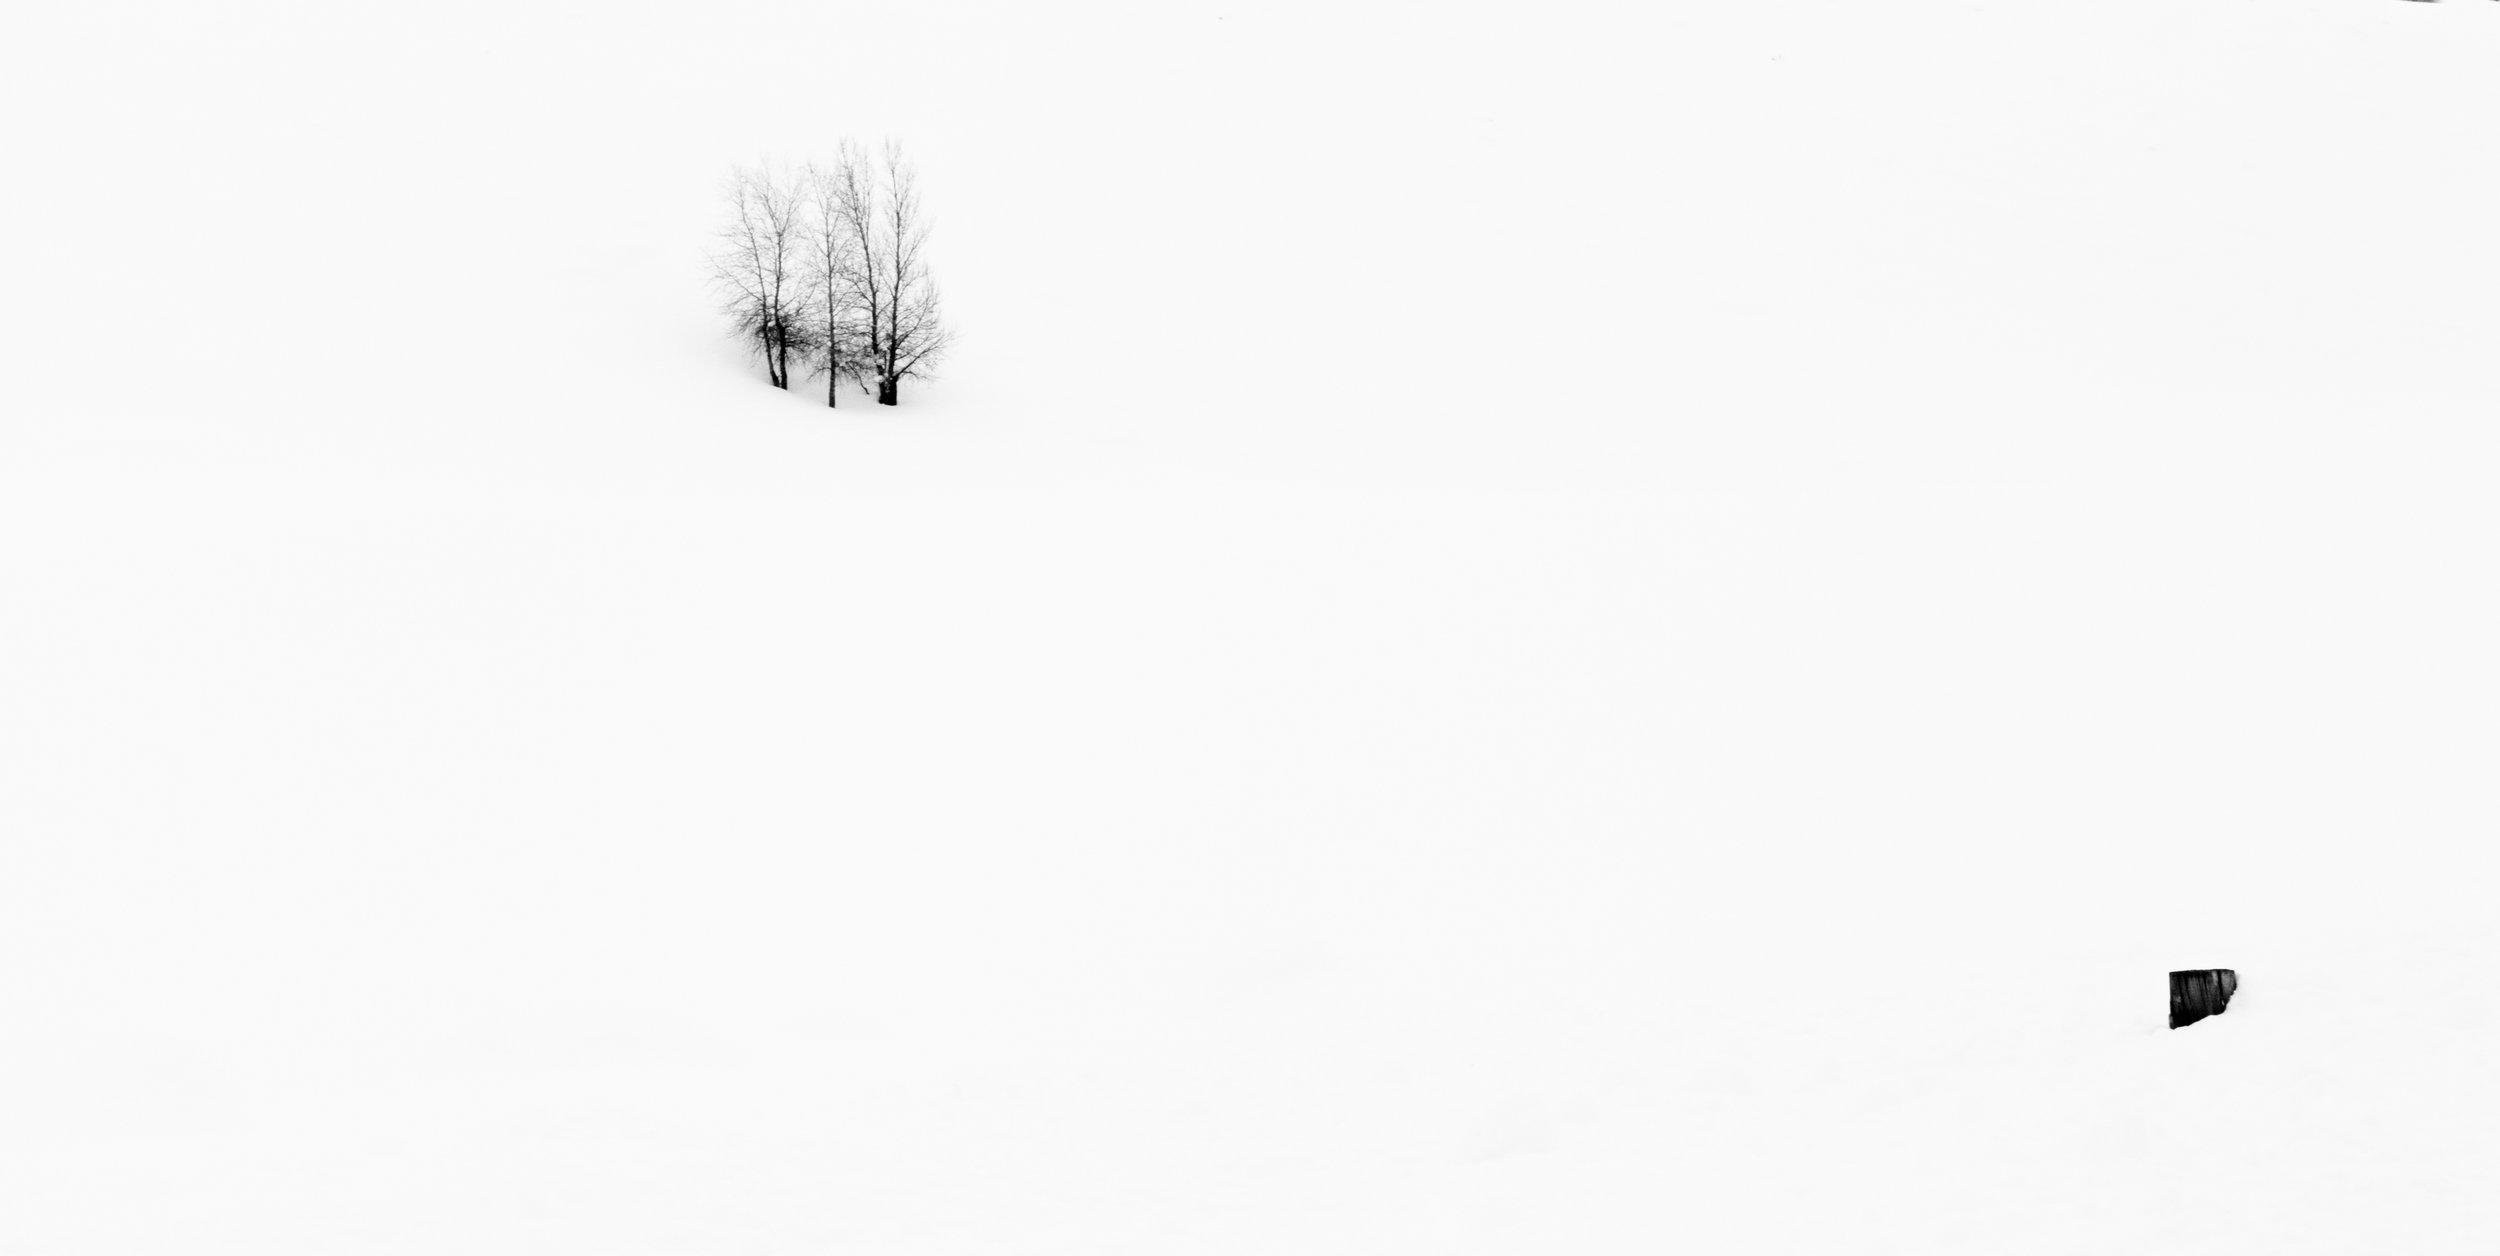 tree fence post hill snow.JPG